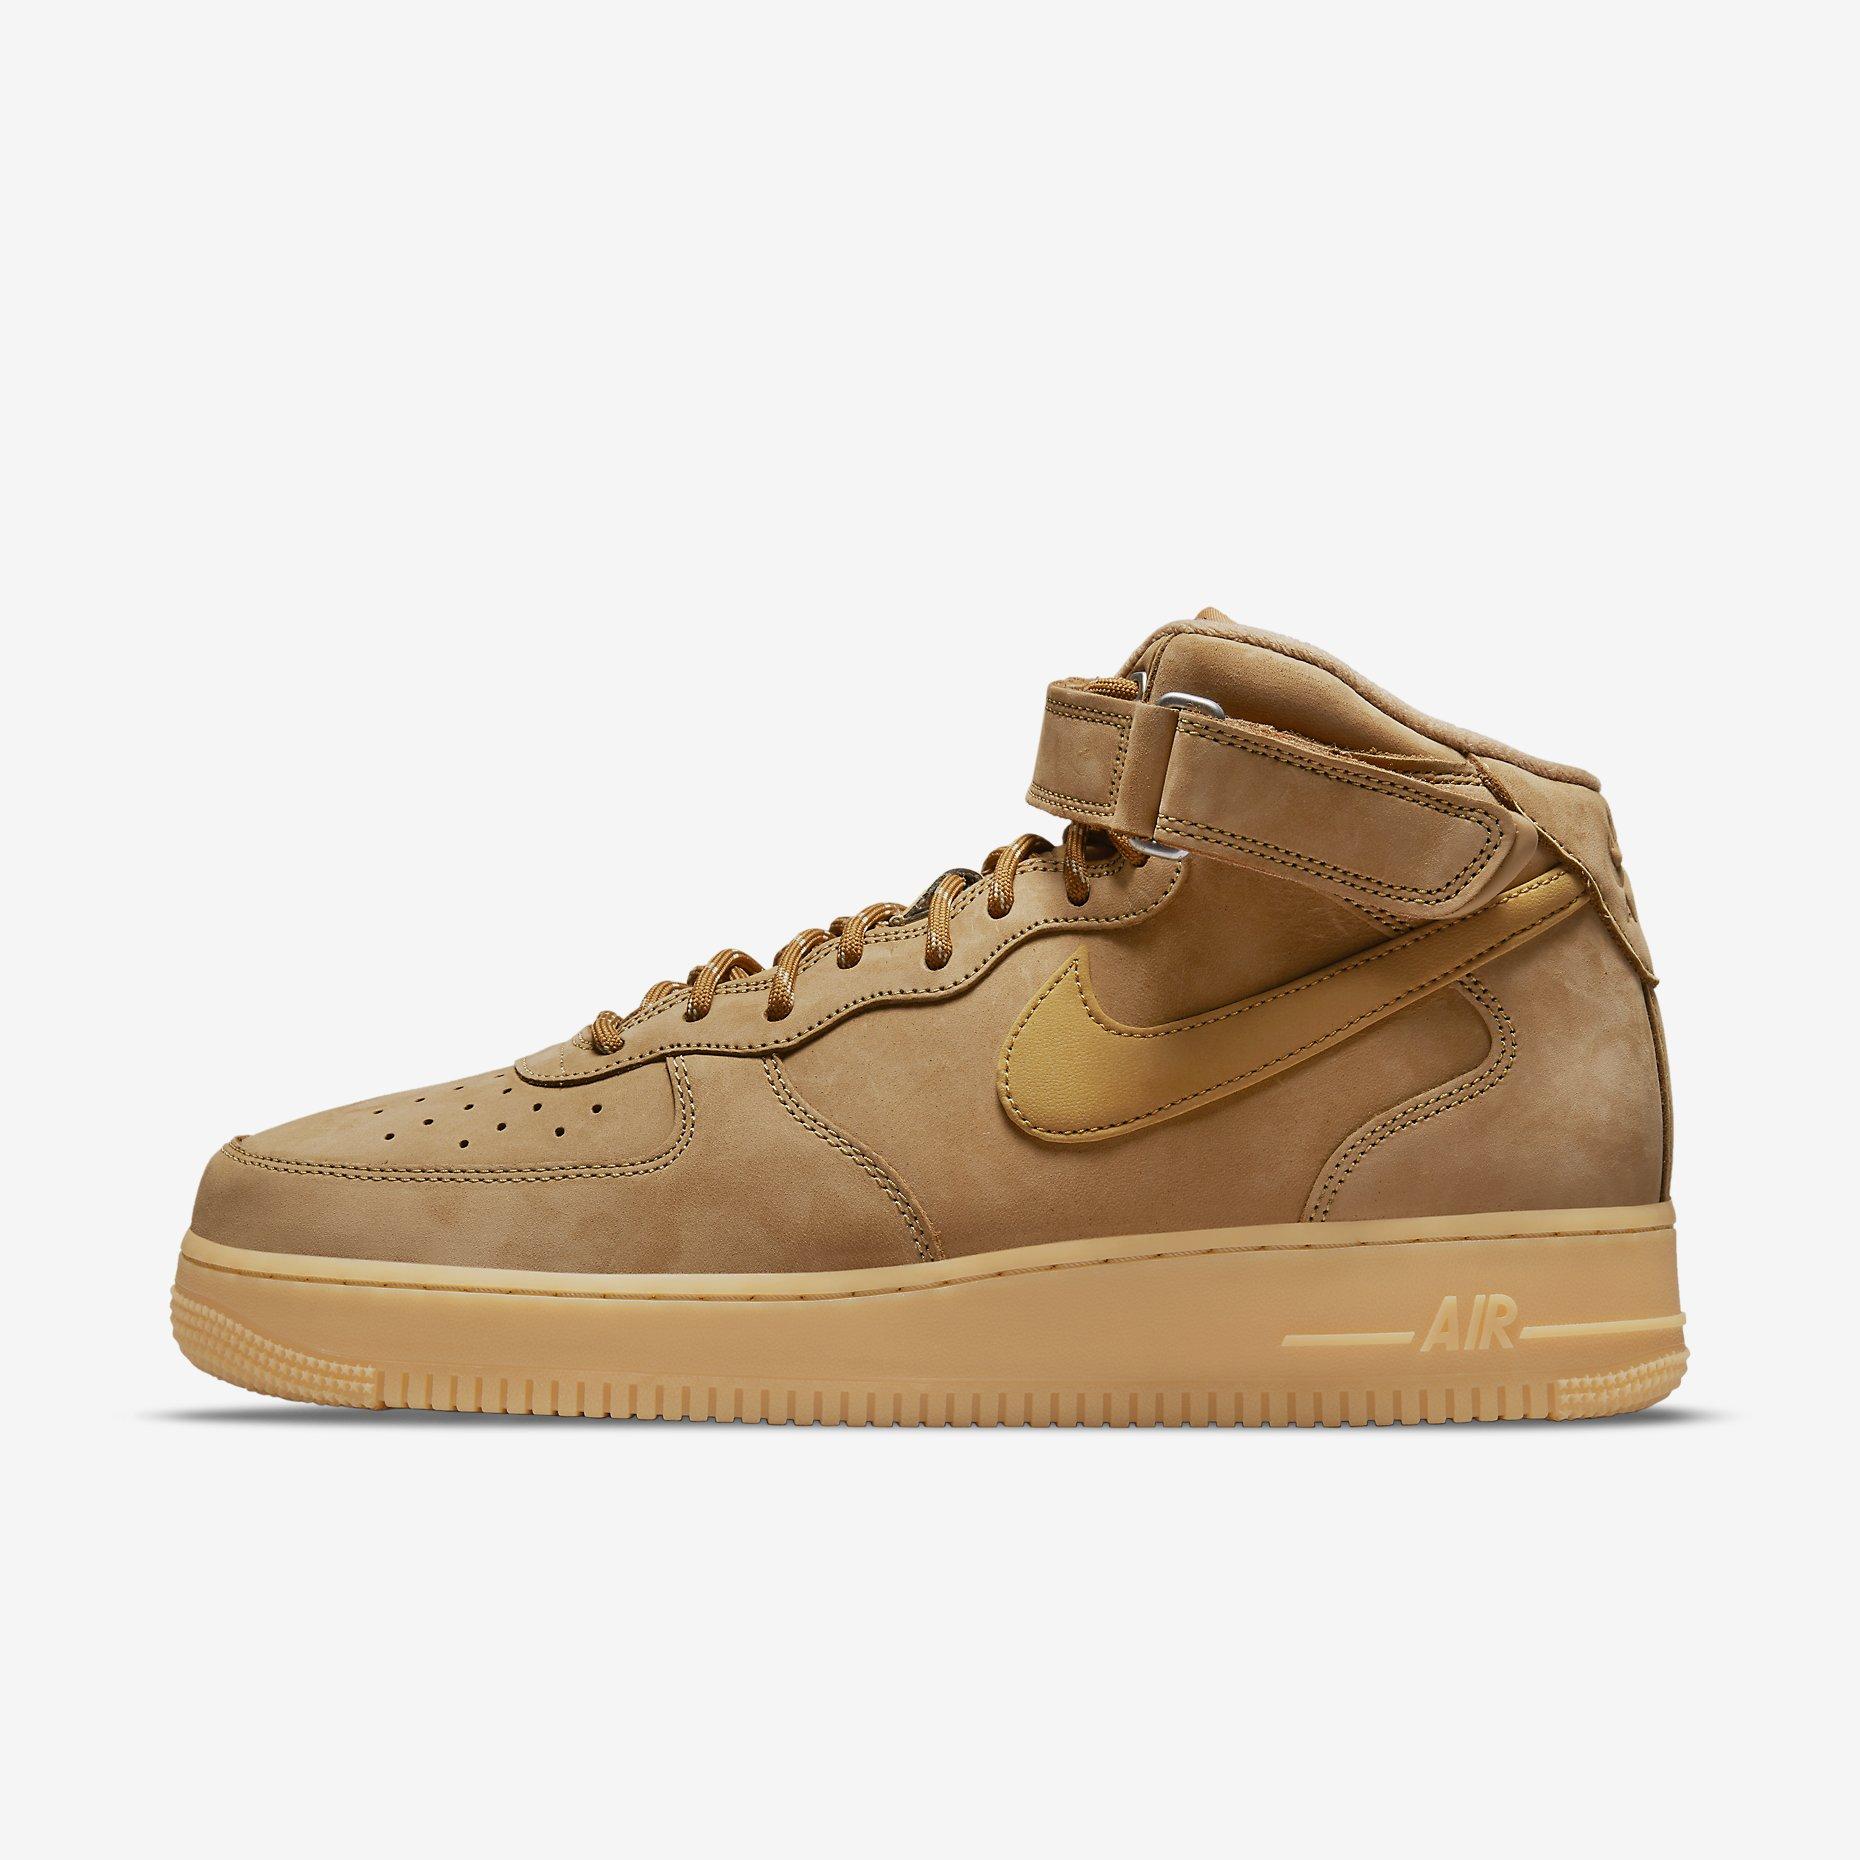 Nike Air Force 1 Mid '07 'Flax'